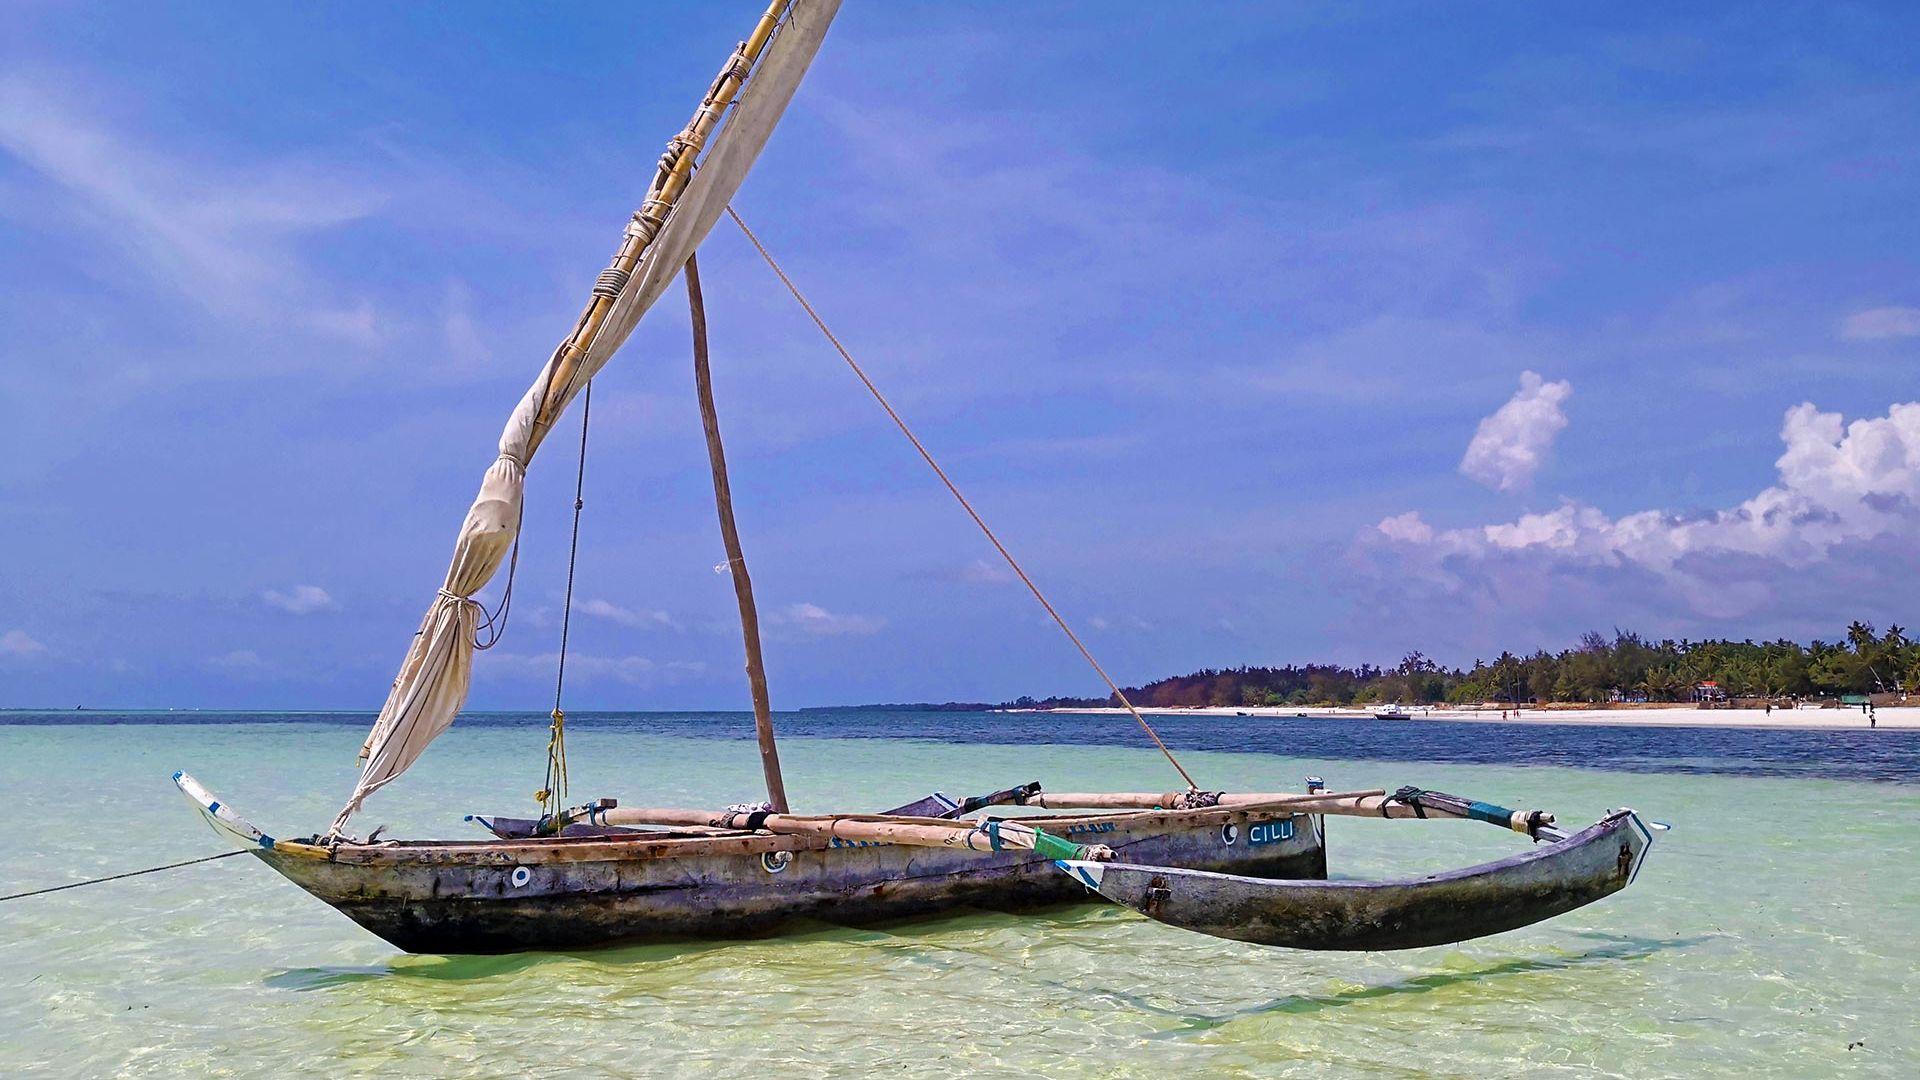 Sejur charter all inclusive Malindi, Kenya, 9 zile - decembrie 2021